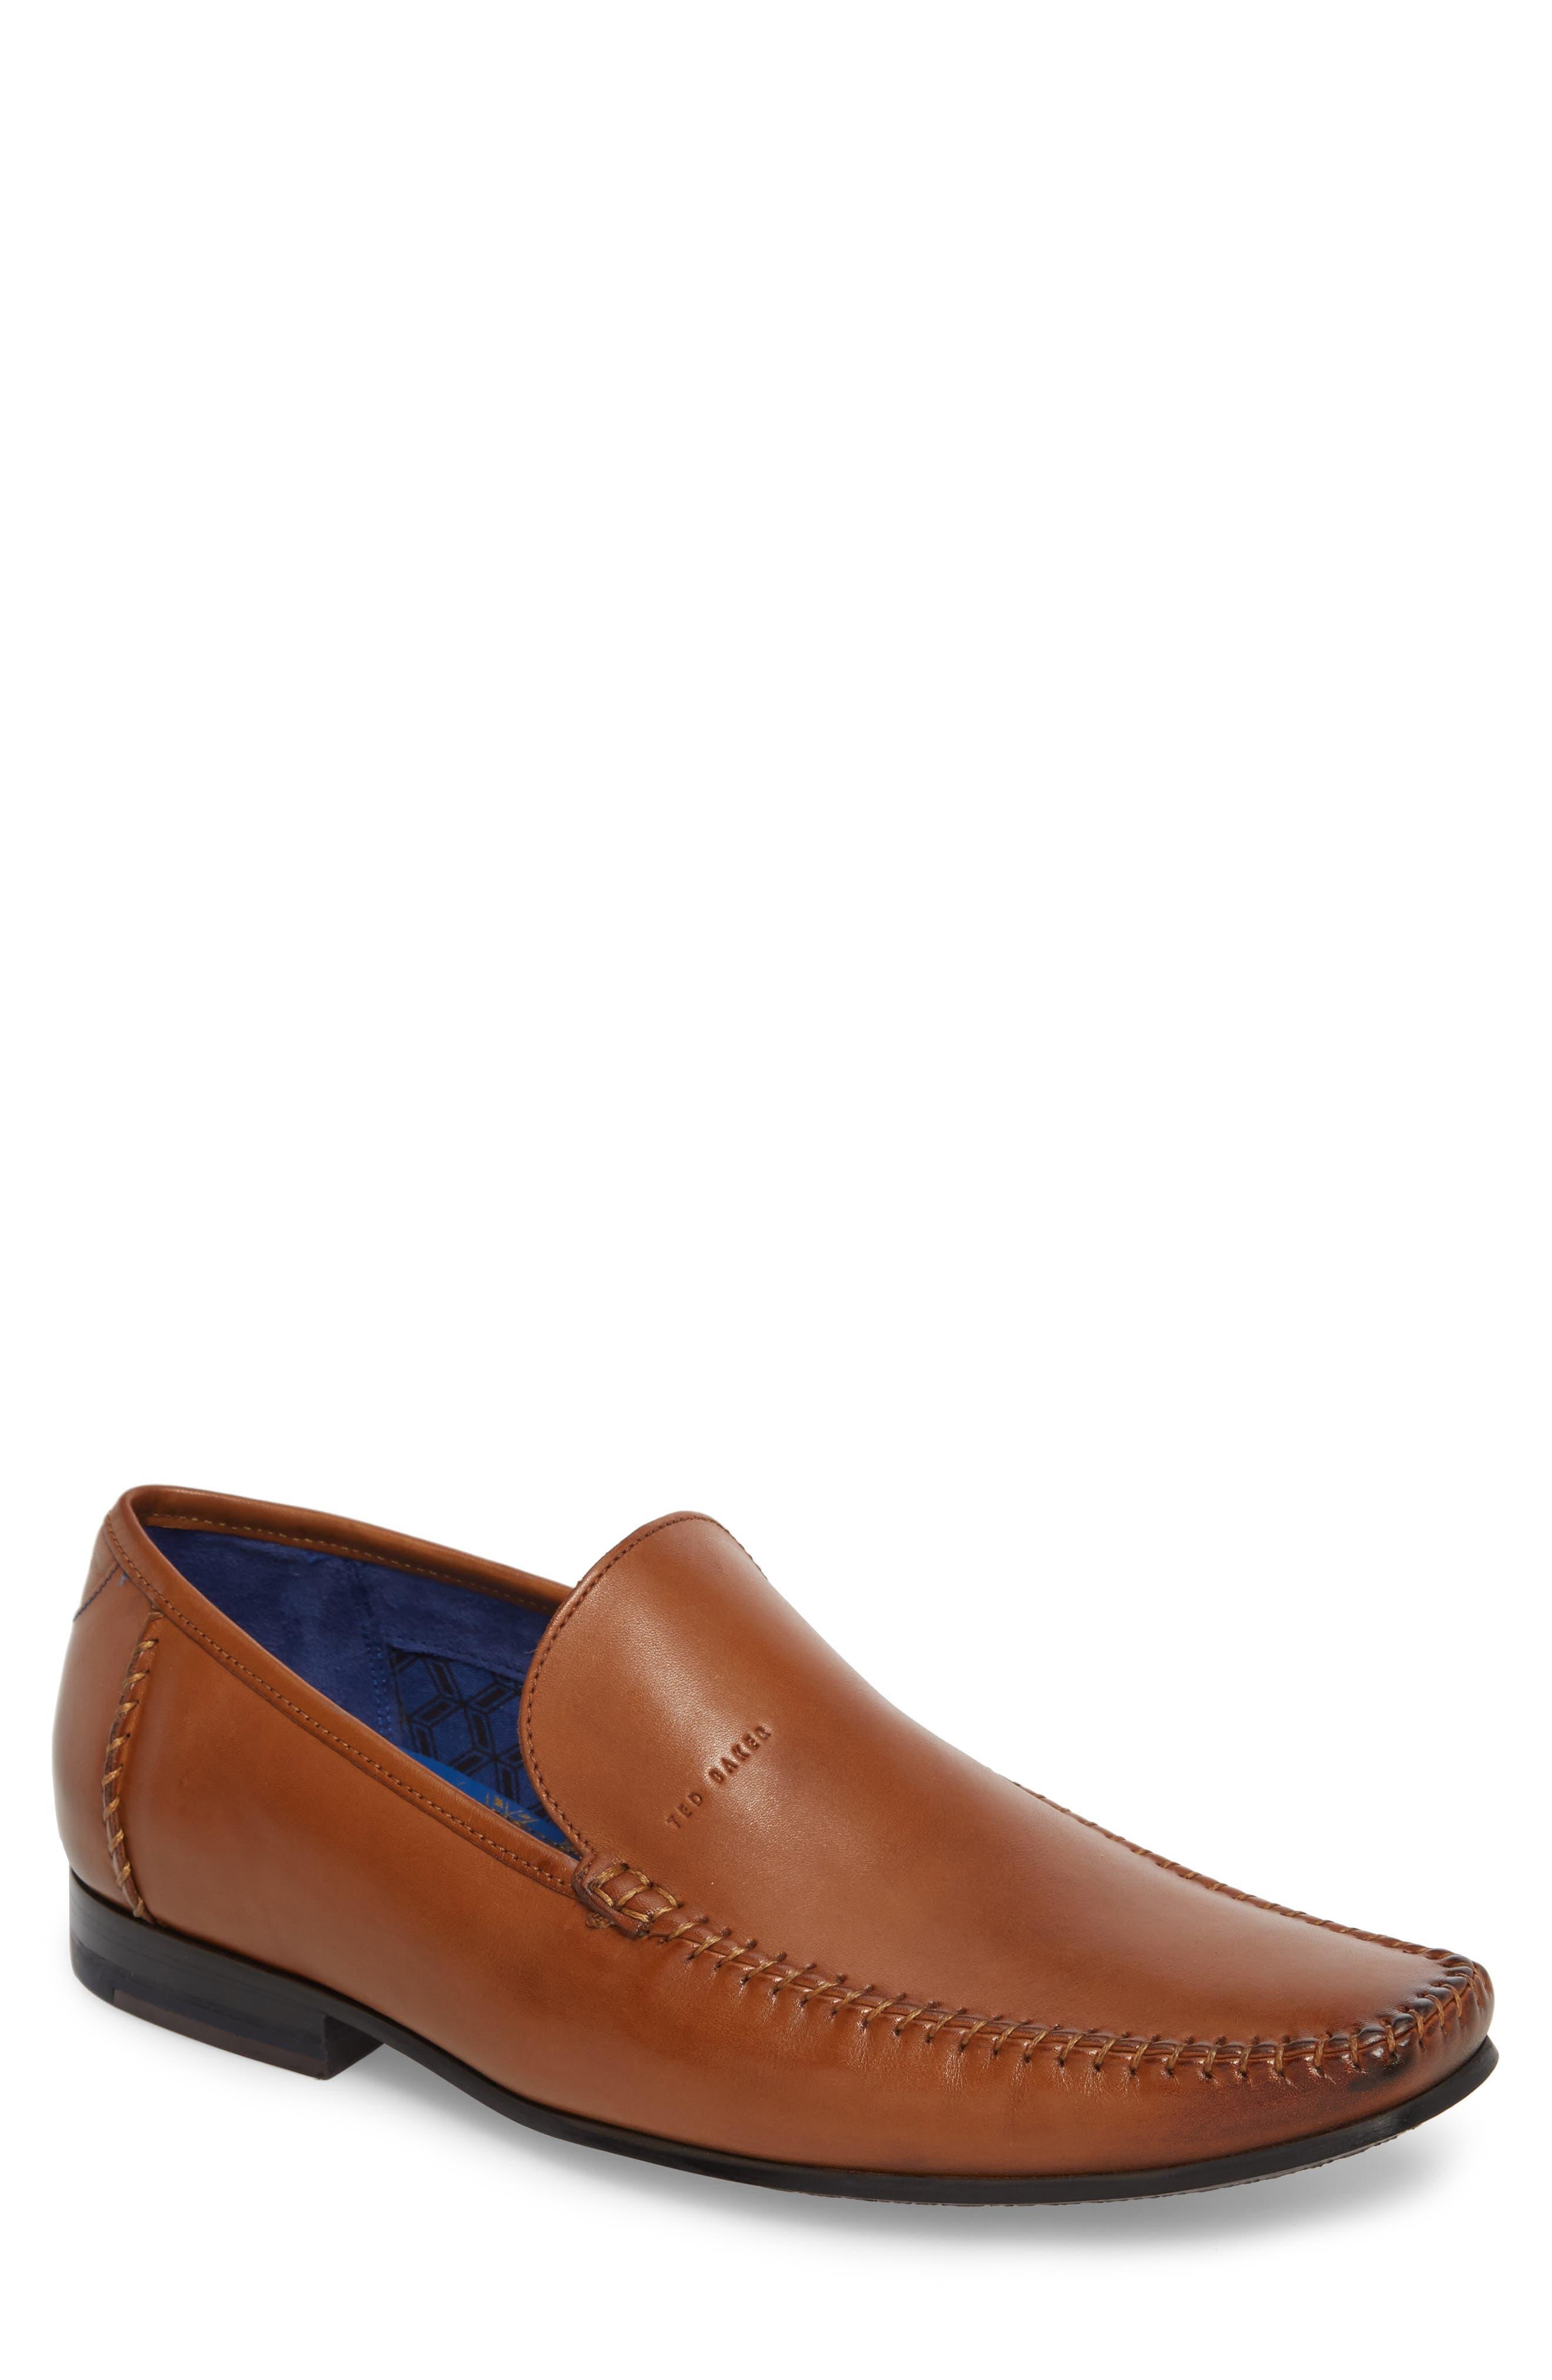 Ted Baker London Bly 9 Venetian Loafer, Brown